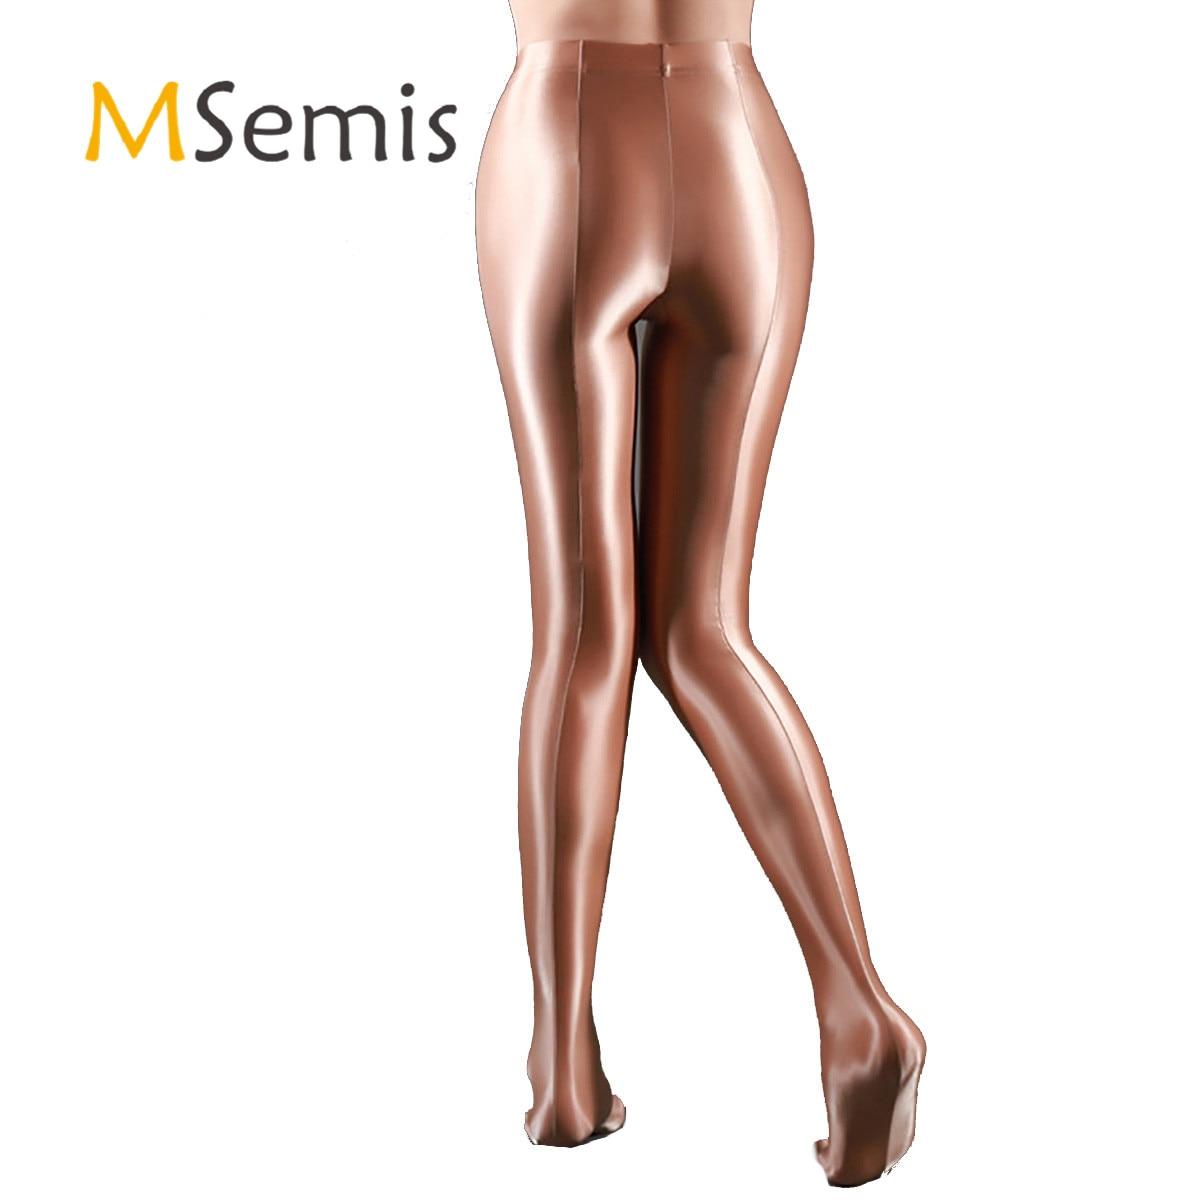 Female Women's Socks Fashion Glossy Pantyhose Ballet Dance Yoga Leggings Pants Training Fitness Holographic Trousers Tights